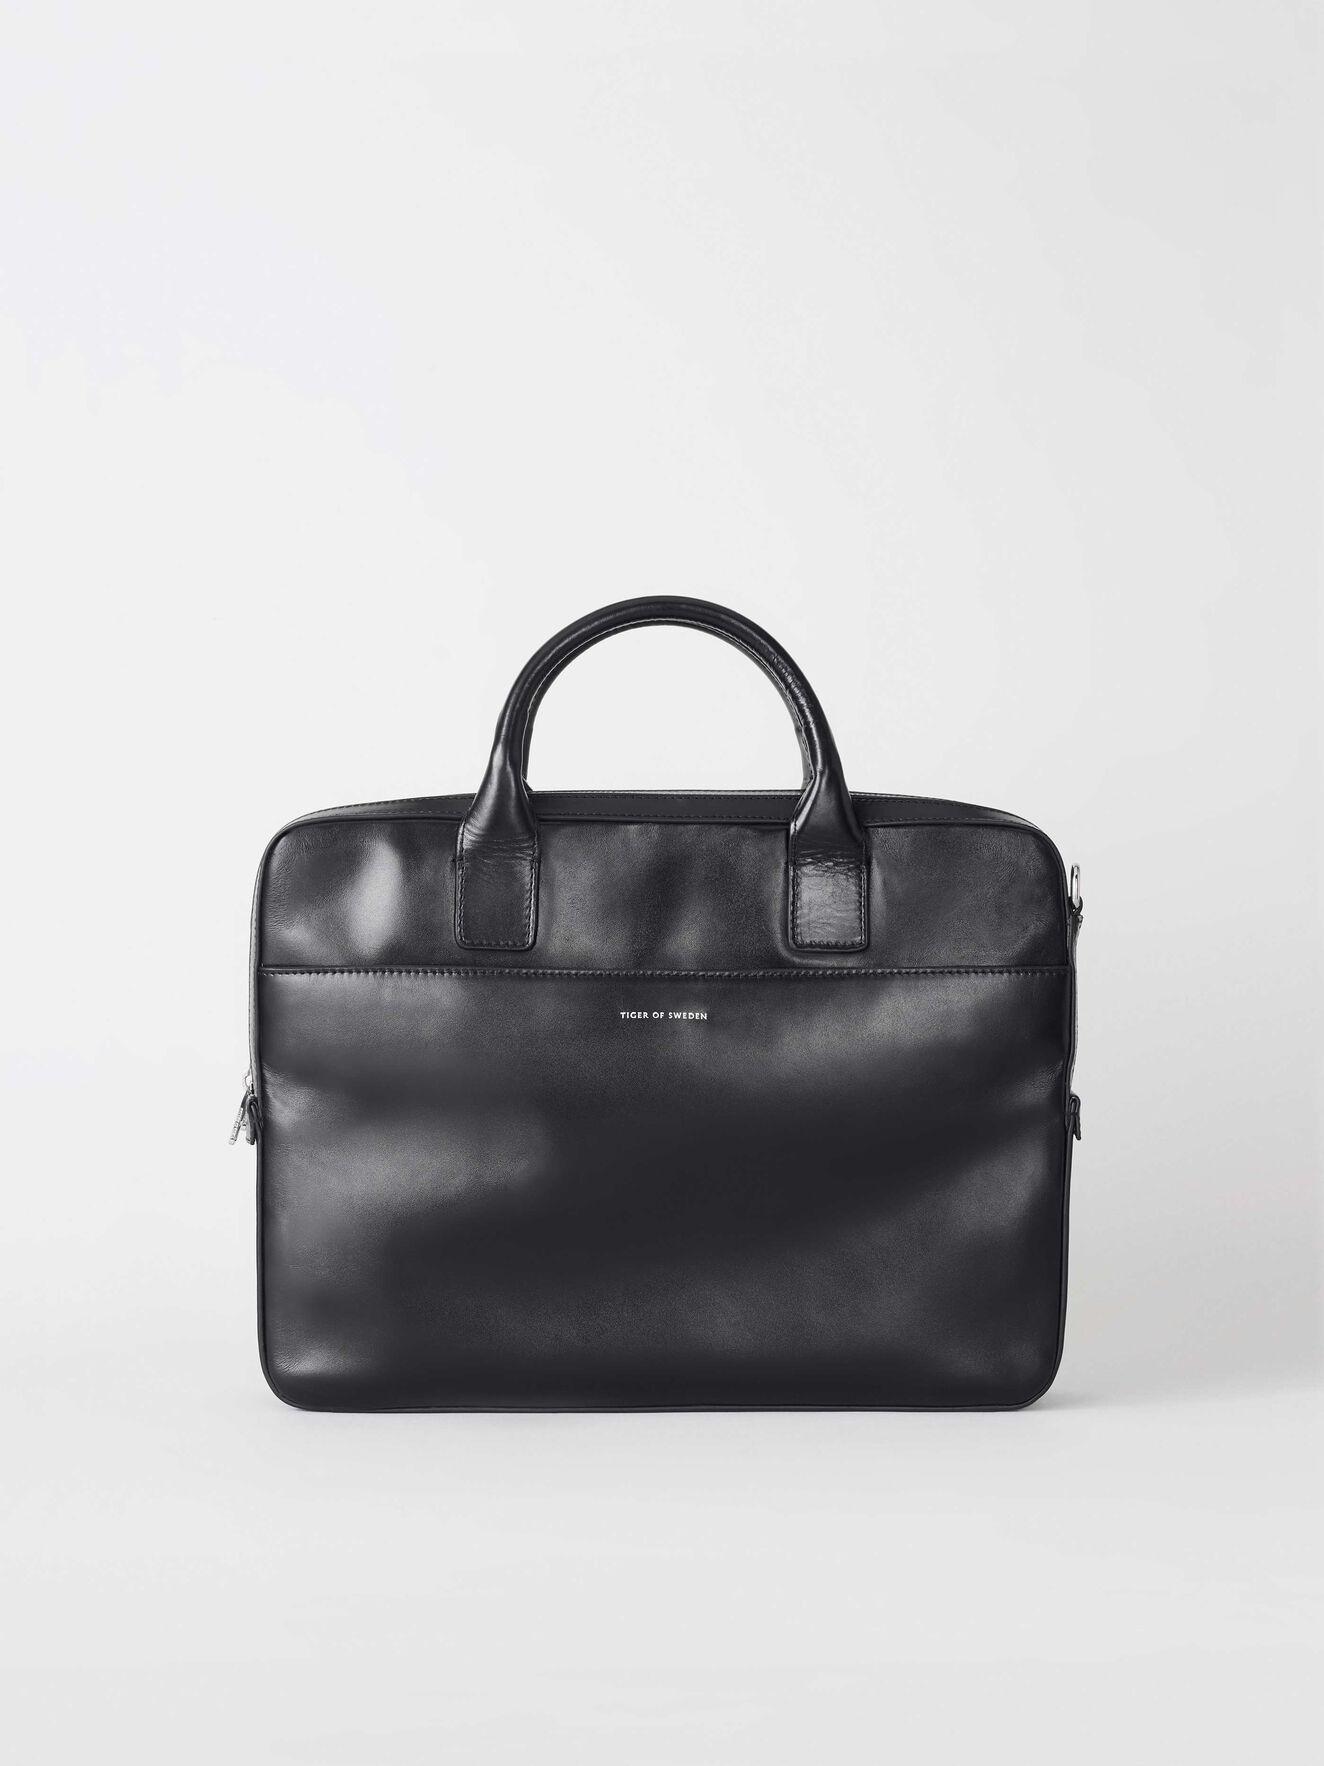 59d2e20e7f6f Bags - Shop our extensive bag range online at Tiger of Sweden